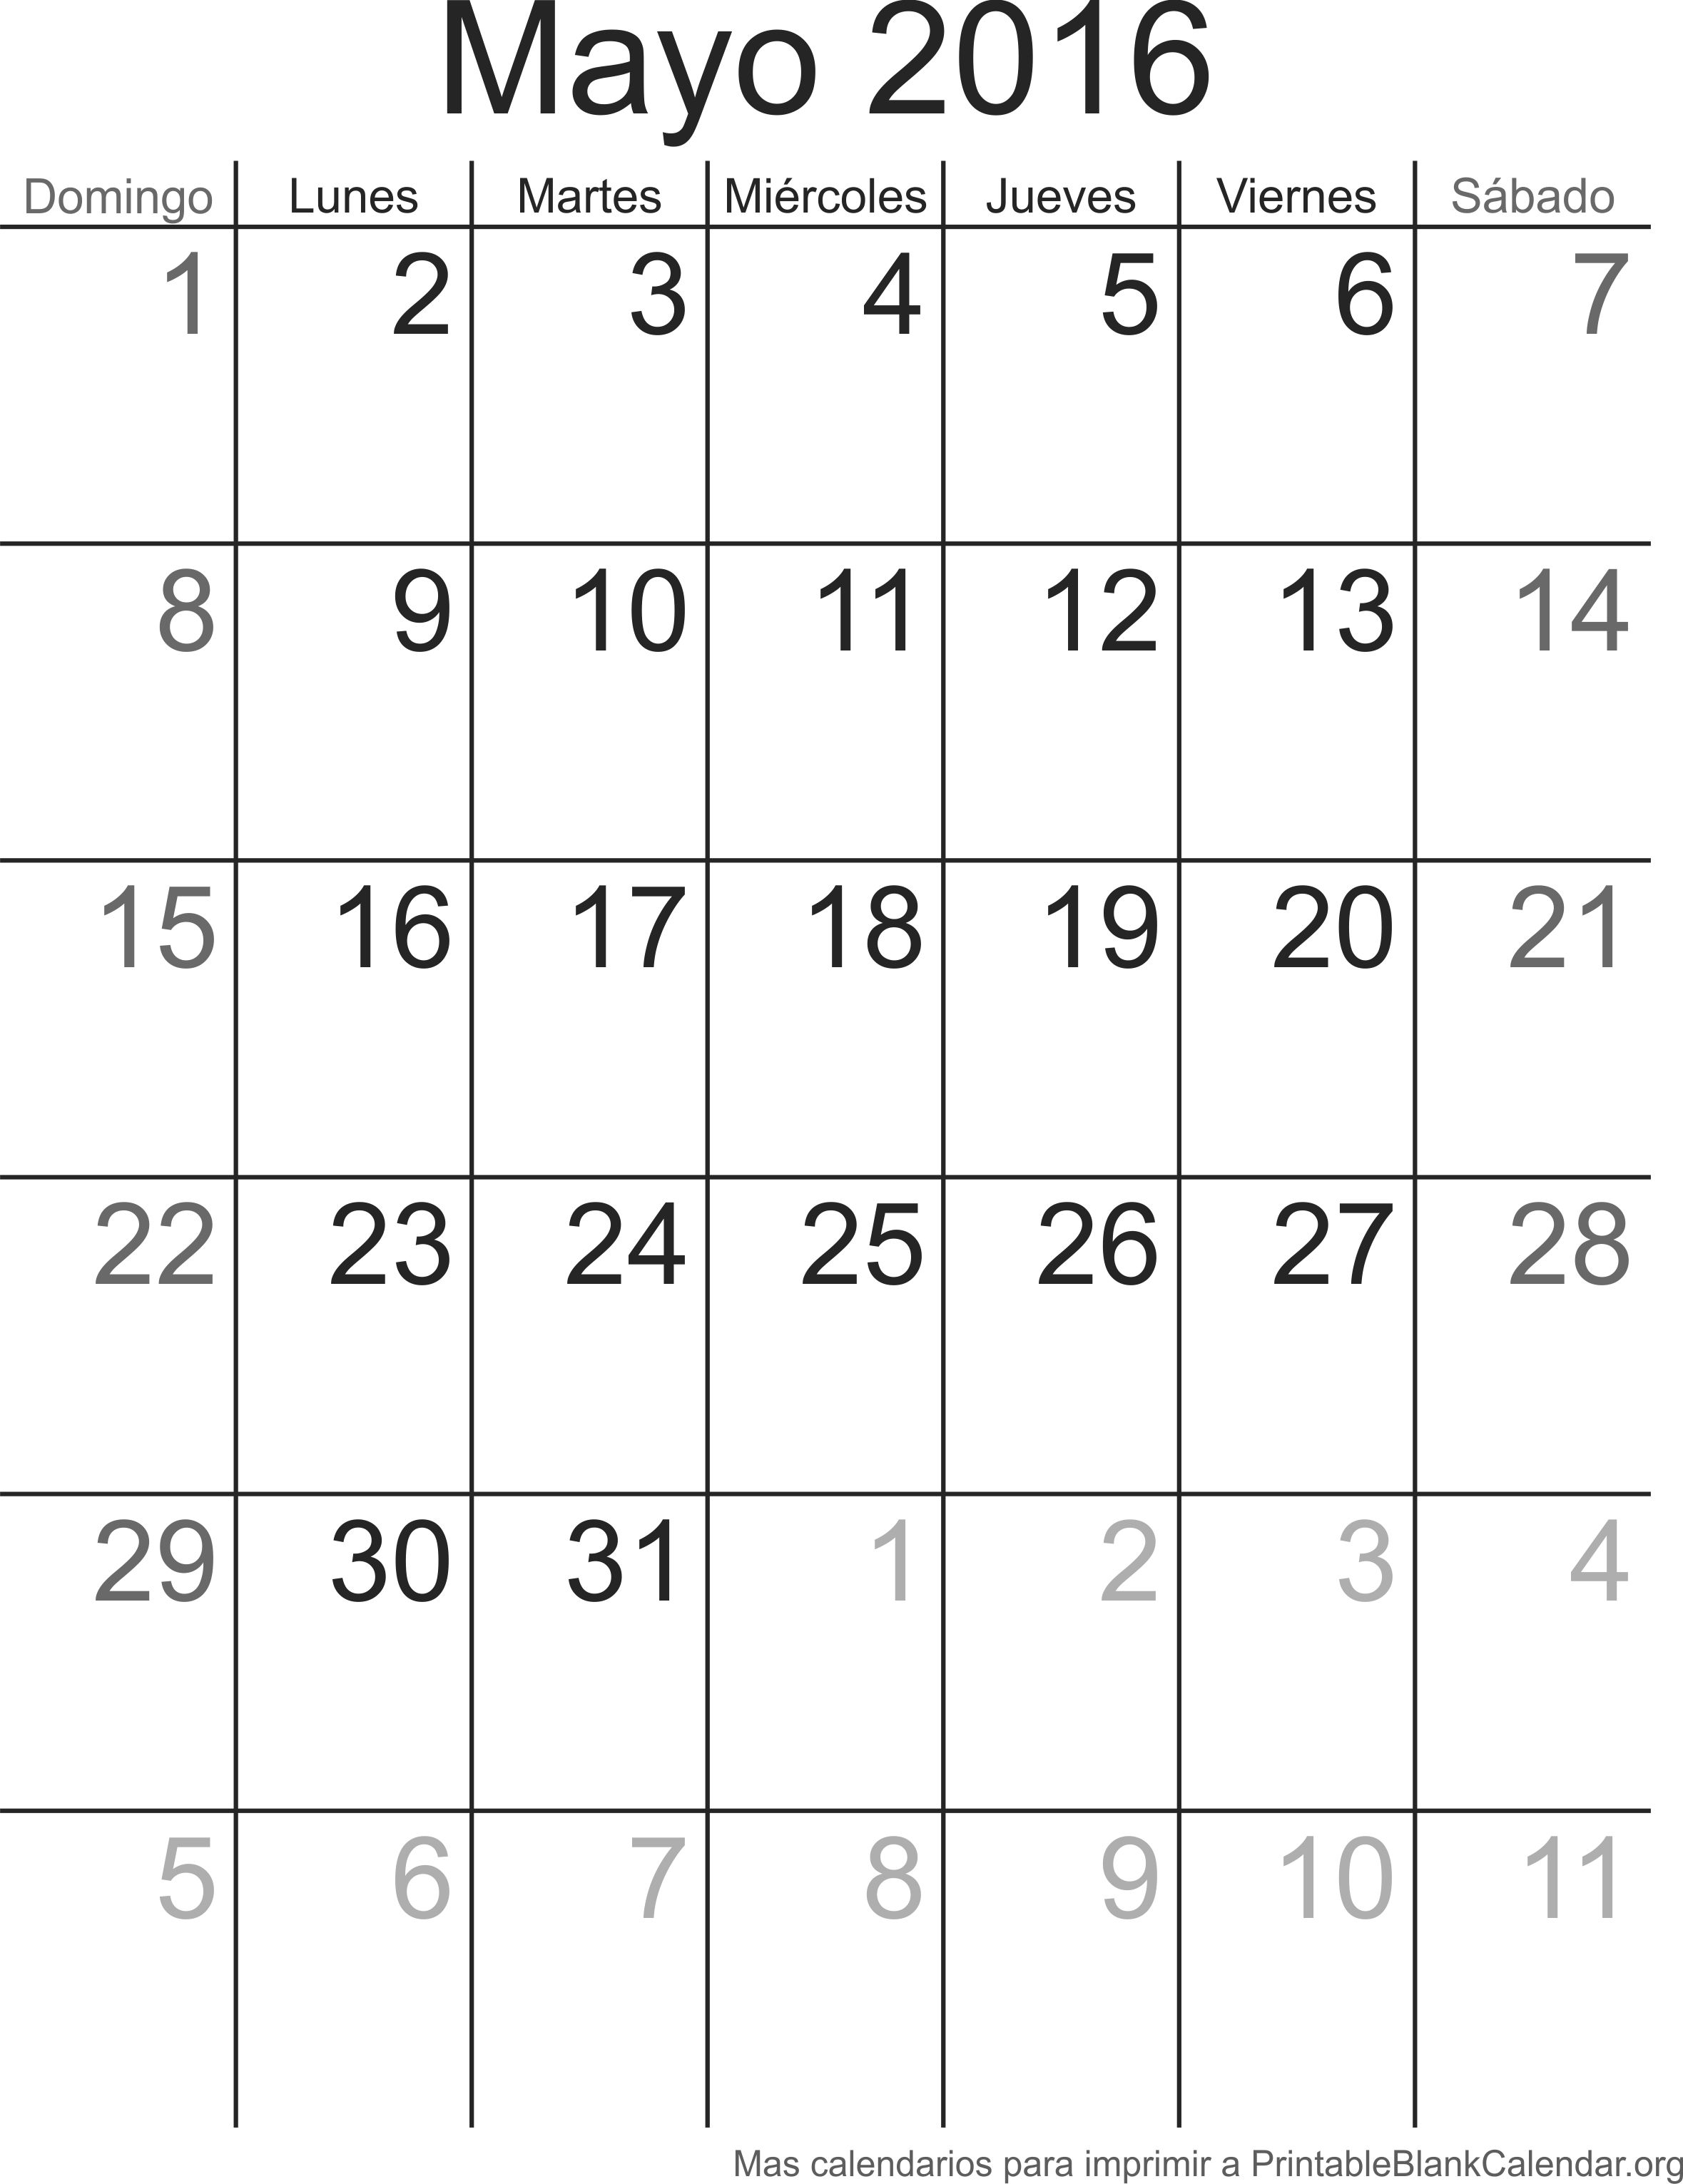 Imprimir calendario Mayo 2016